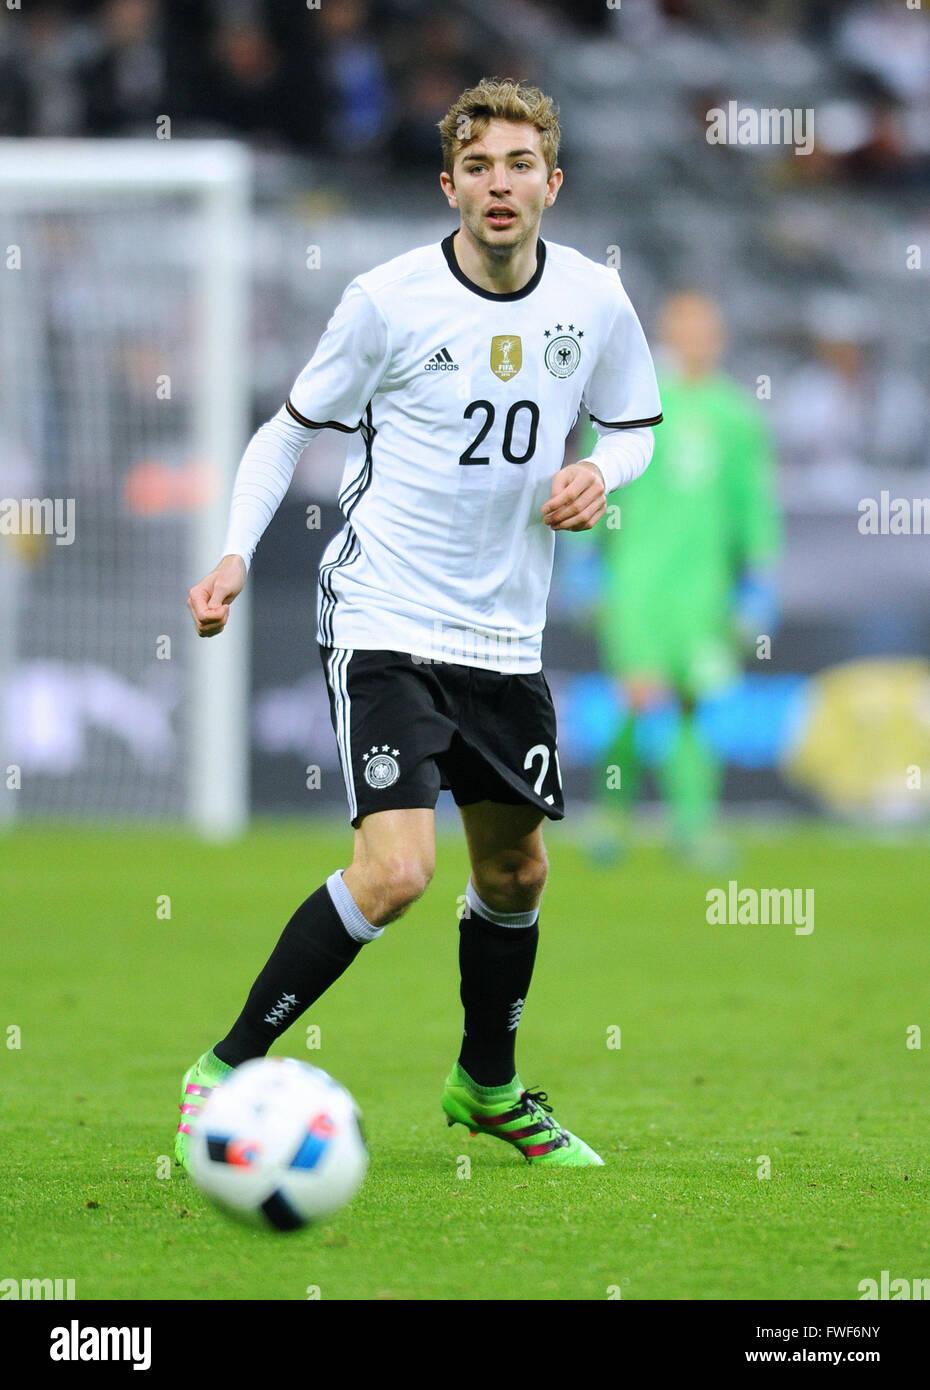 Friendly match at Allianz Arena Munich, Germany vs Italy: Christoph Kramer (GER) - Stock Image